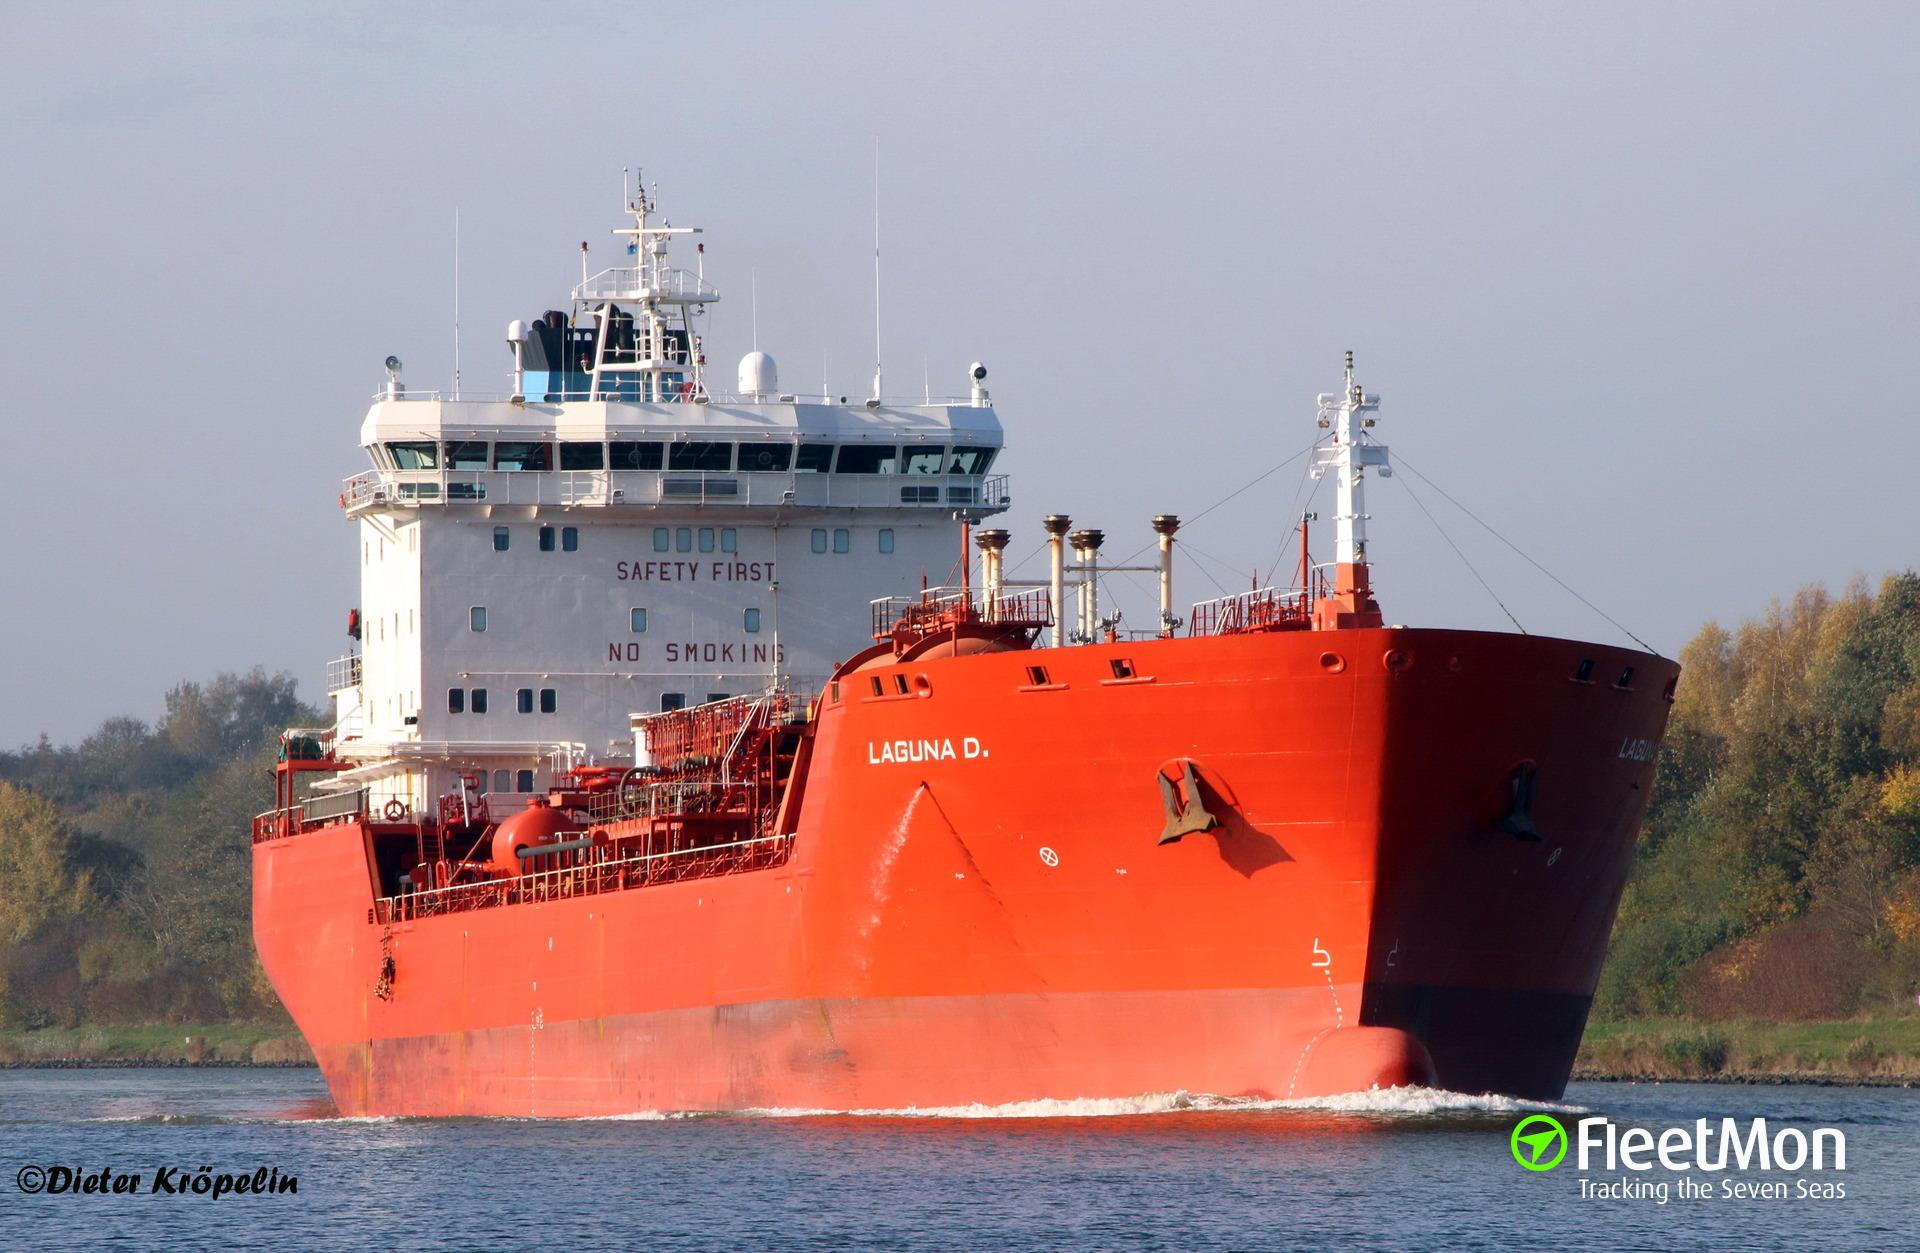 Dutch tanker Laguna D involved in cocaine smuggling?